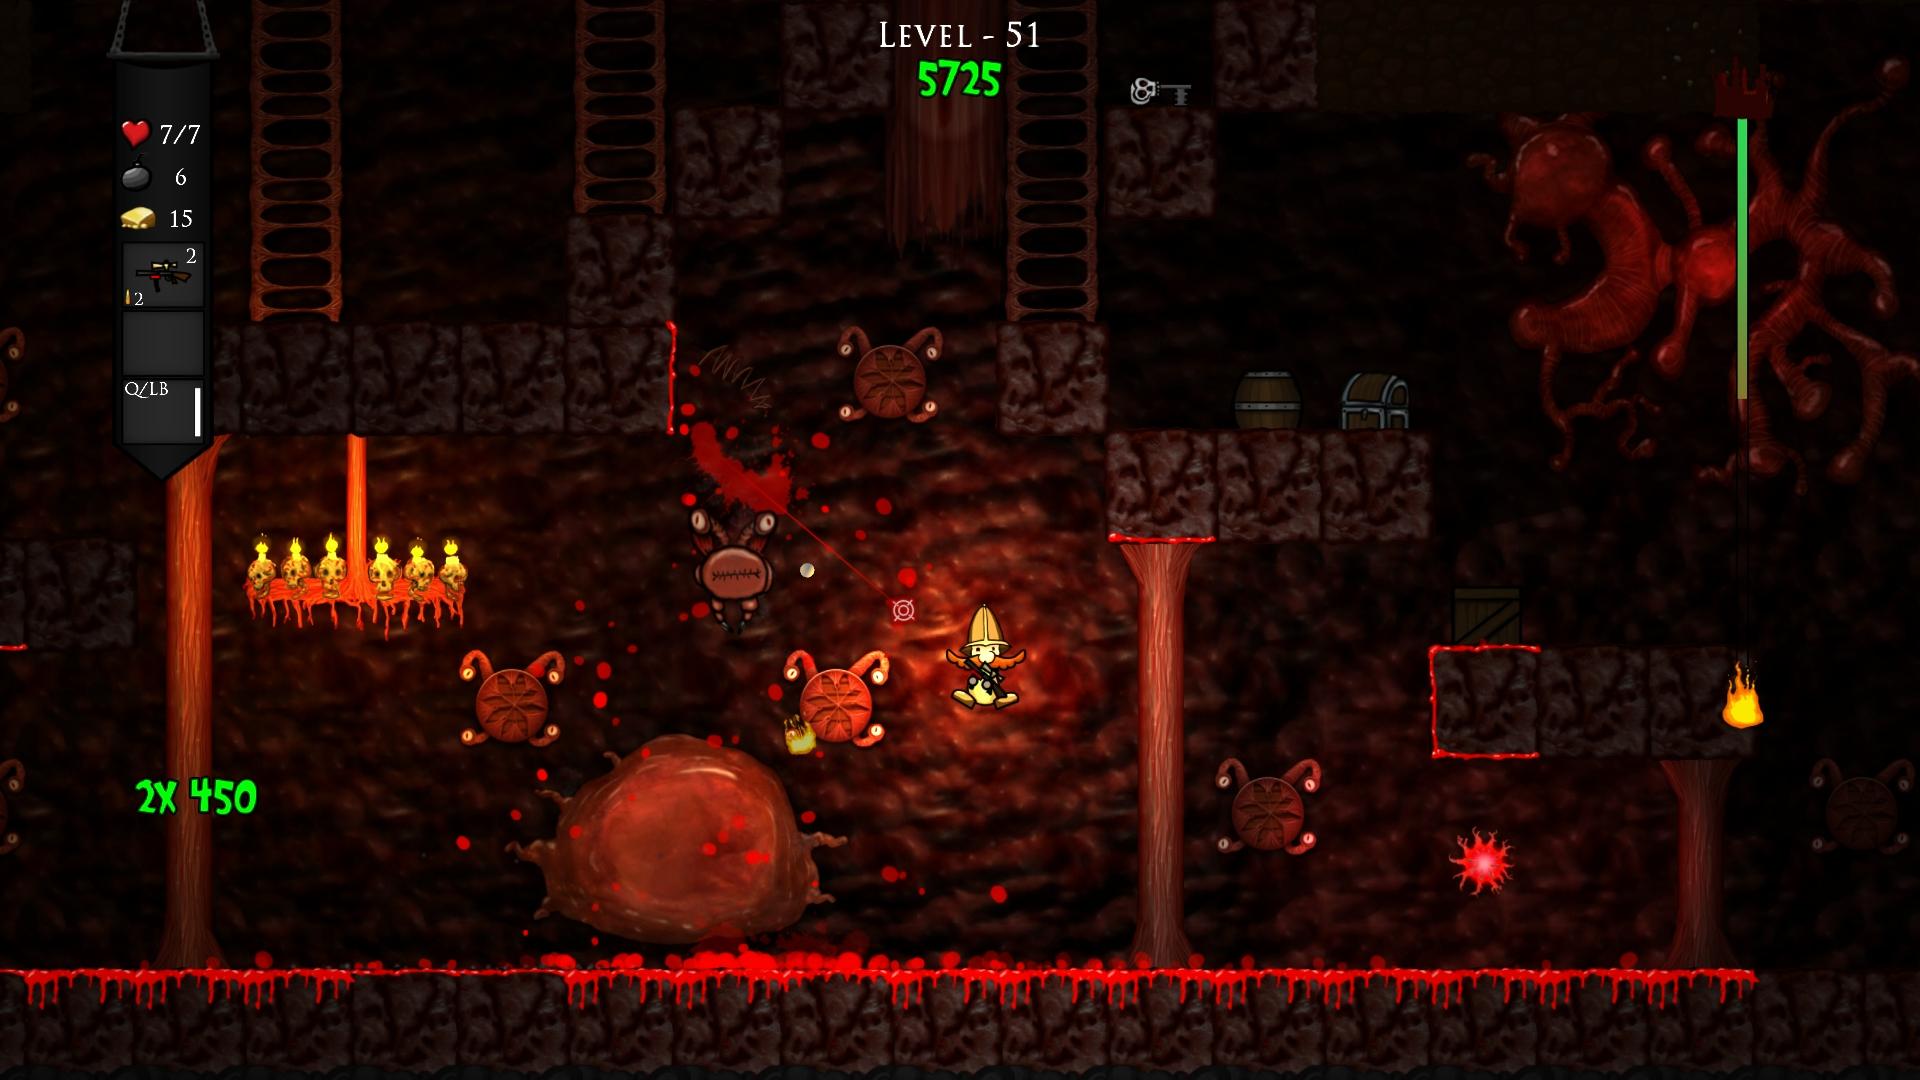 99 Levels To Hell screenshot